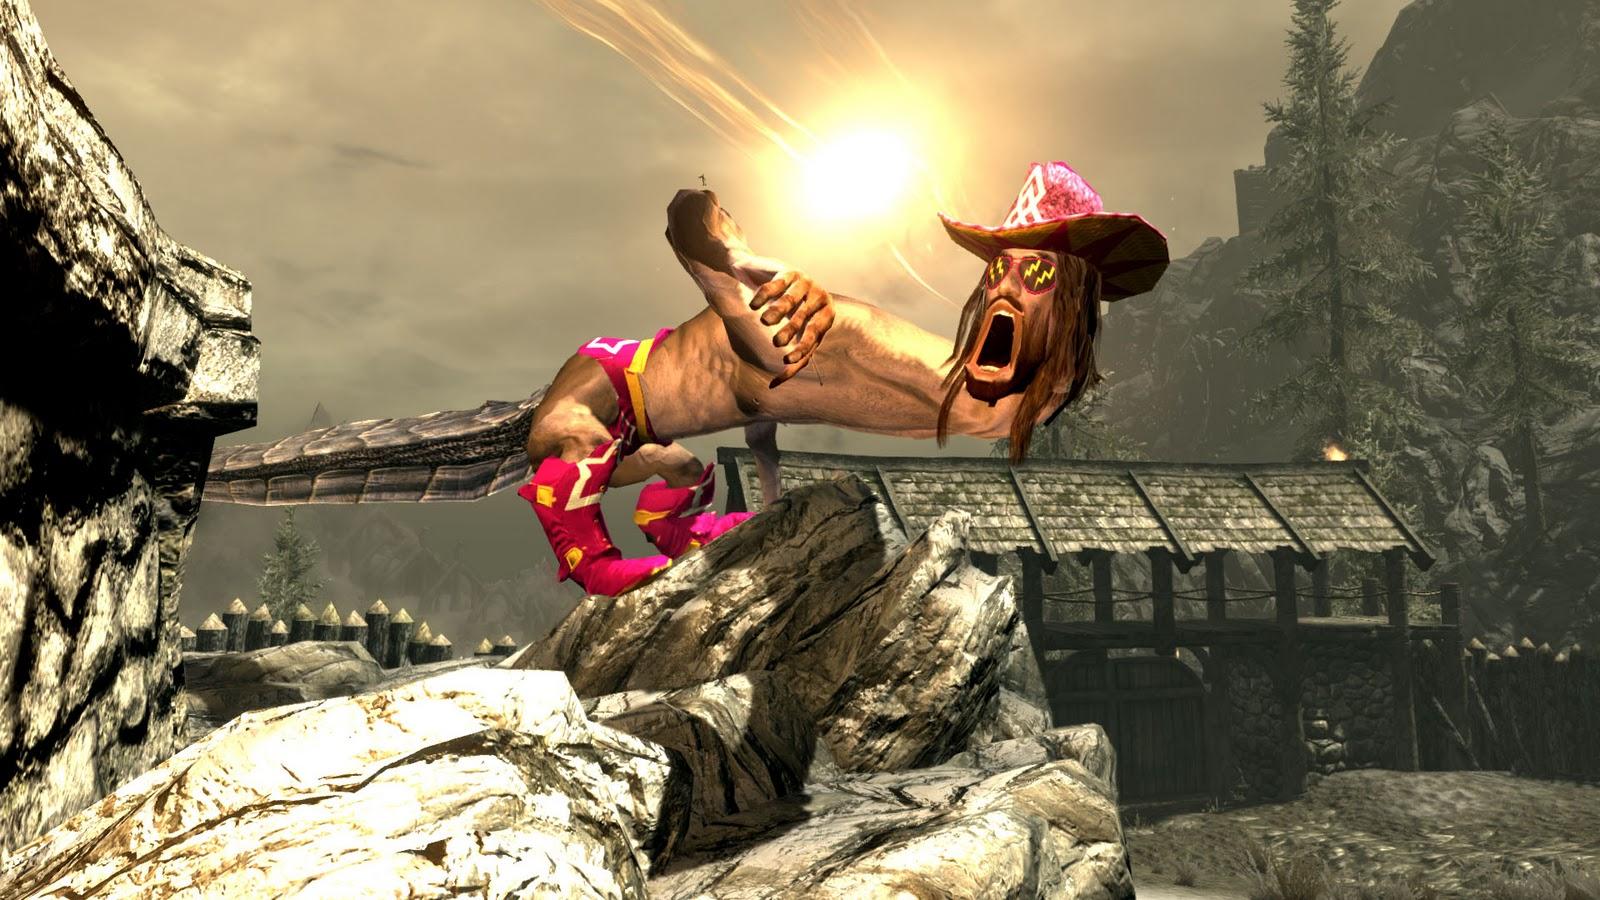 player one gaming macho man skyrim mod